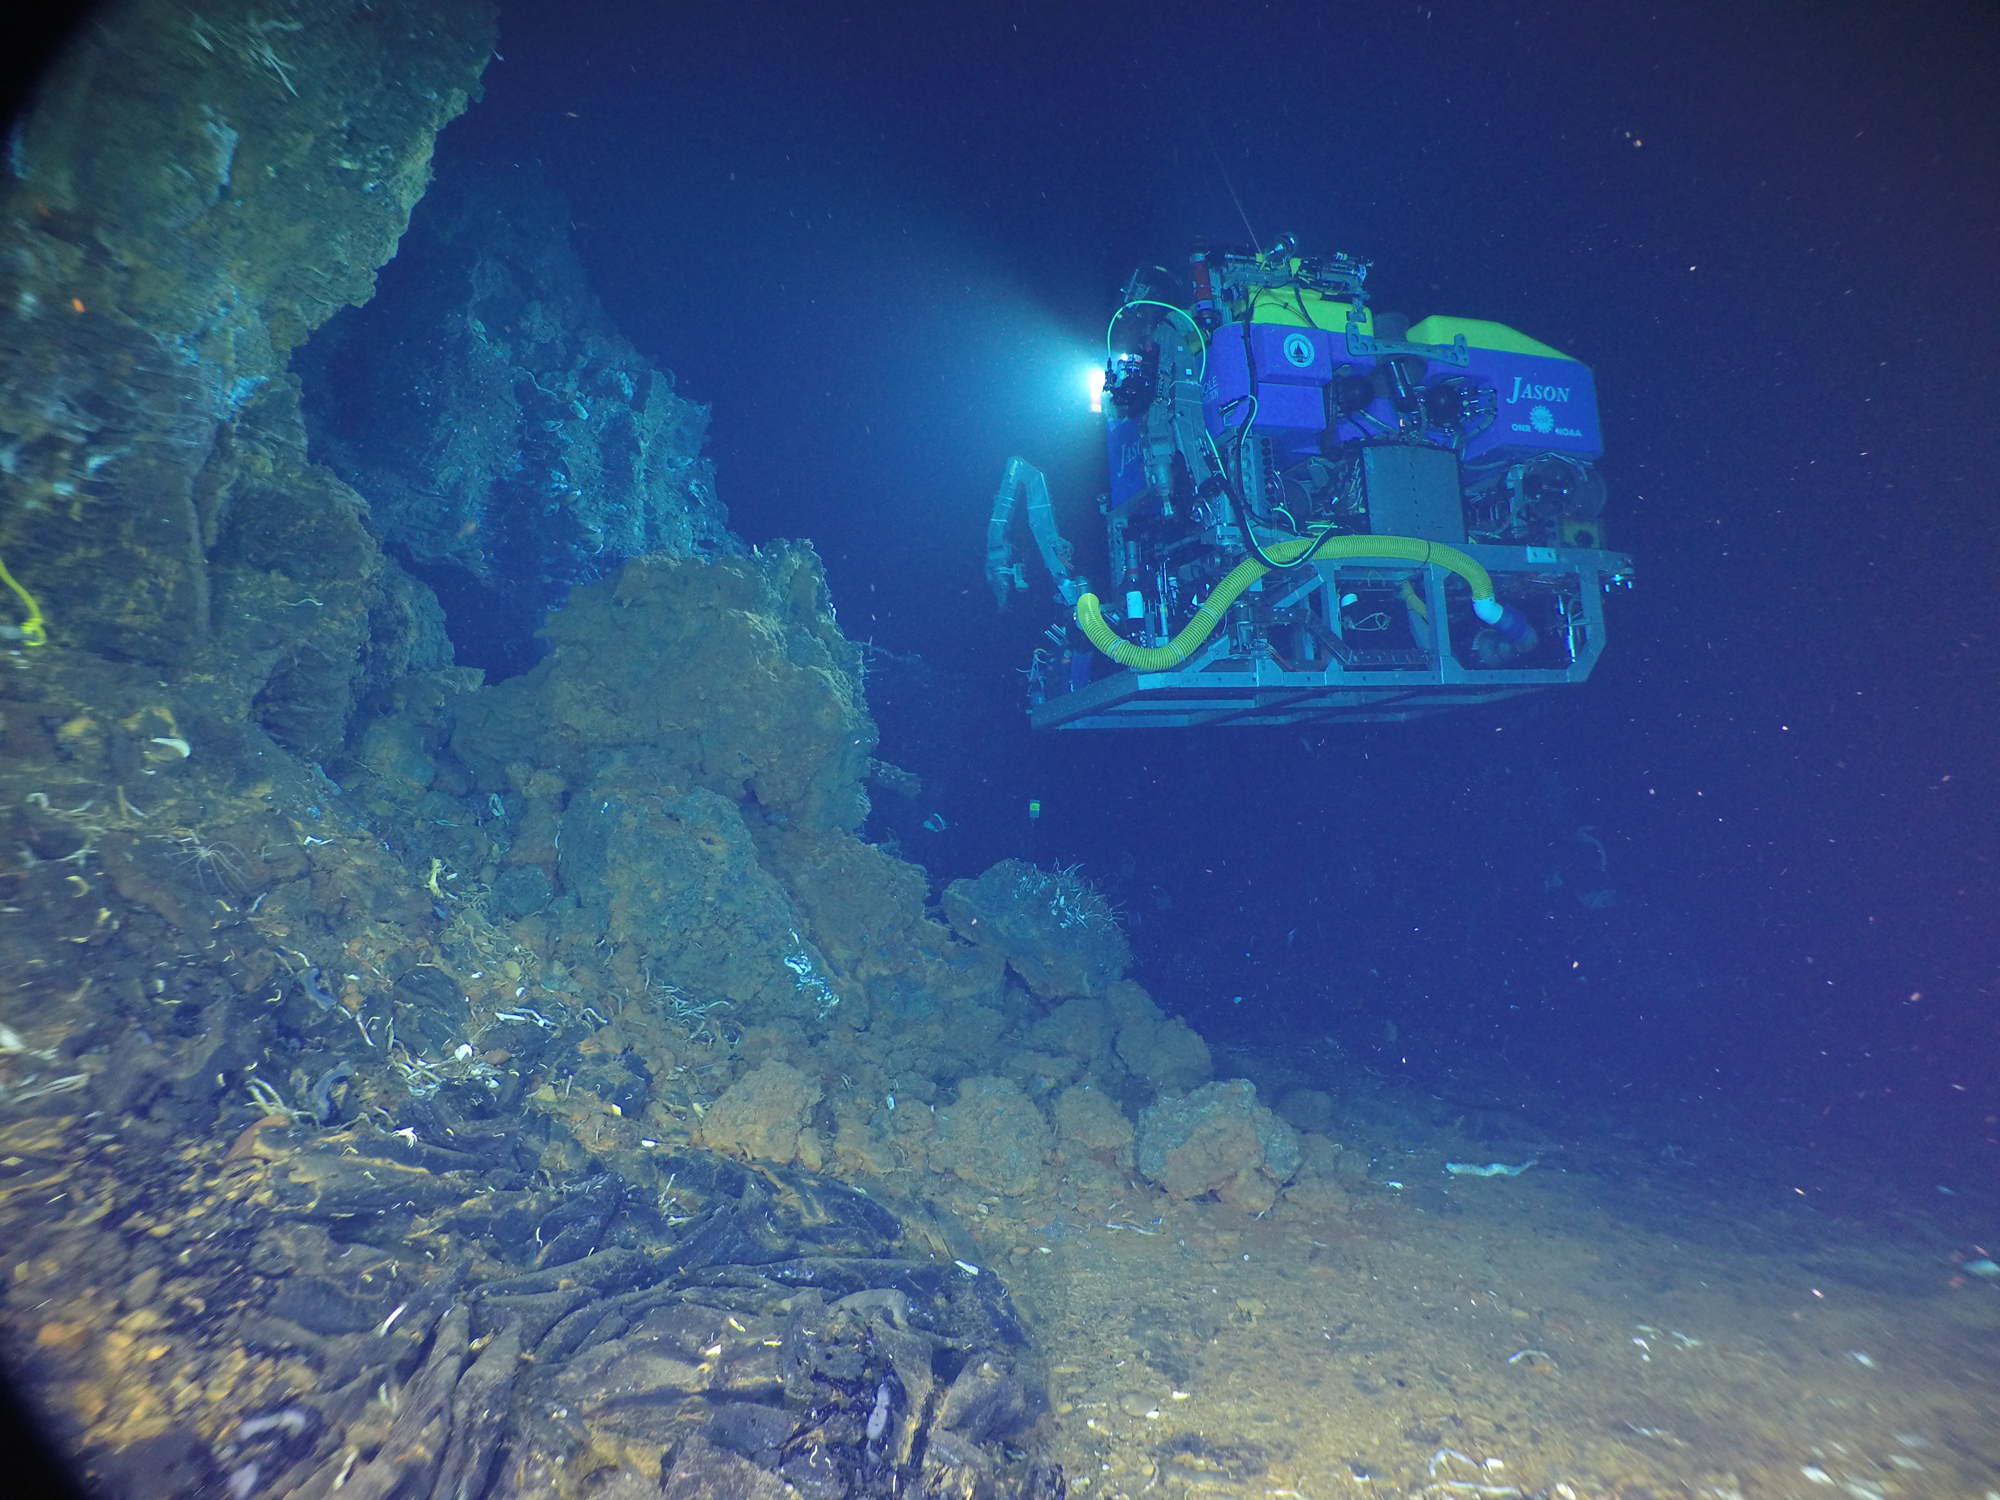 Jason sampling vents and volcanic seafloor